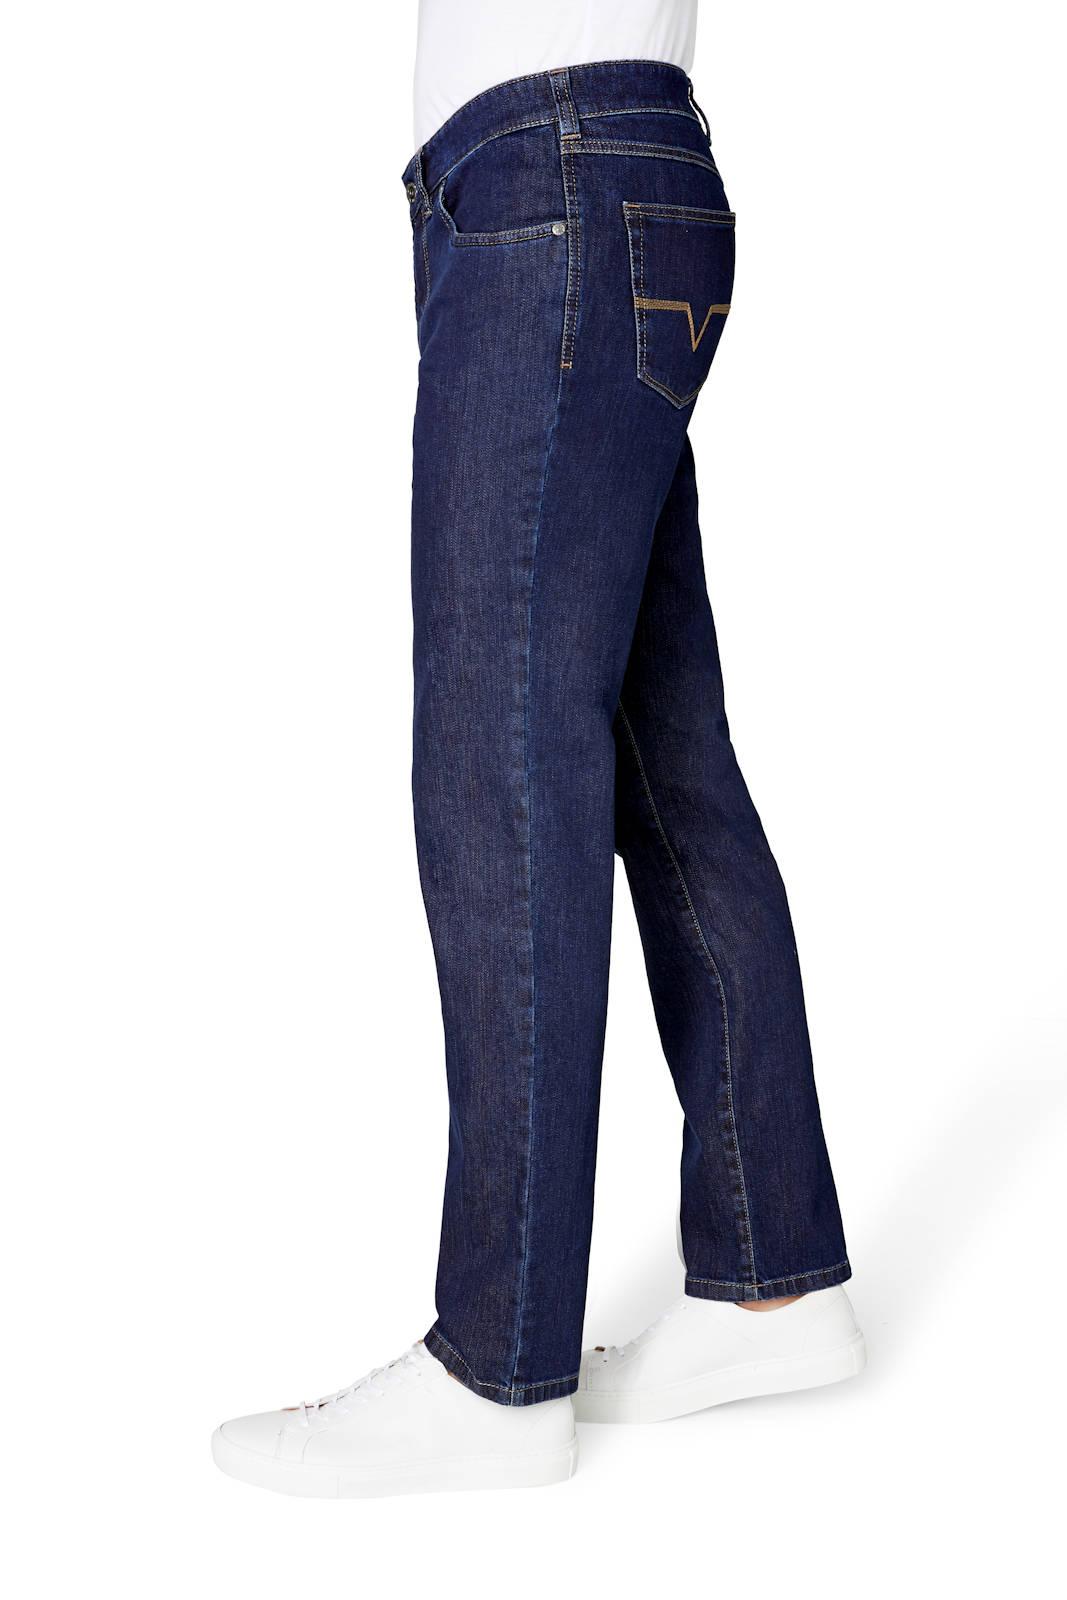 Atelier-GARDEUR-Jeans-NEVIO-11-Regular-Fit-Herren-Hose-Straight-Leg-Denim-NEU Indexbild 11